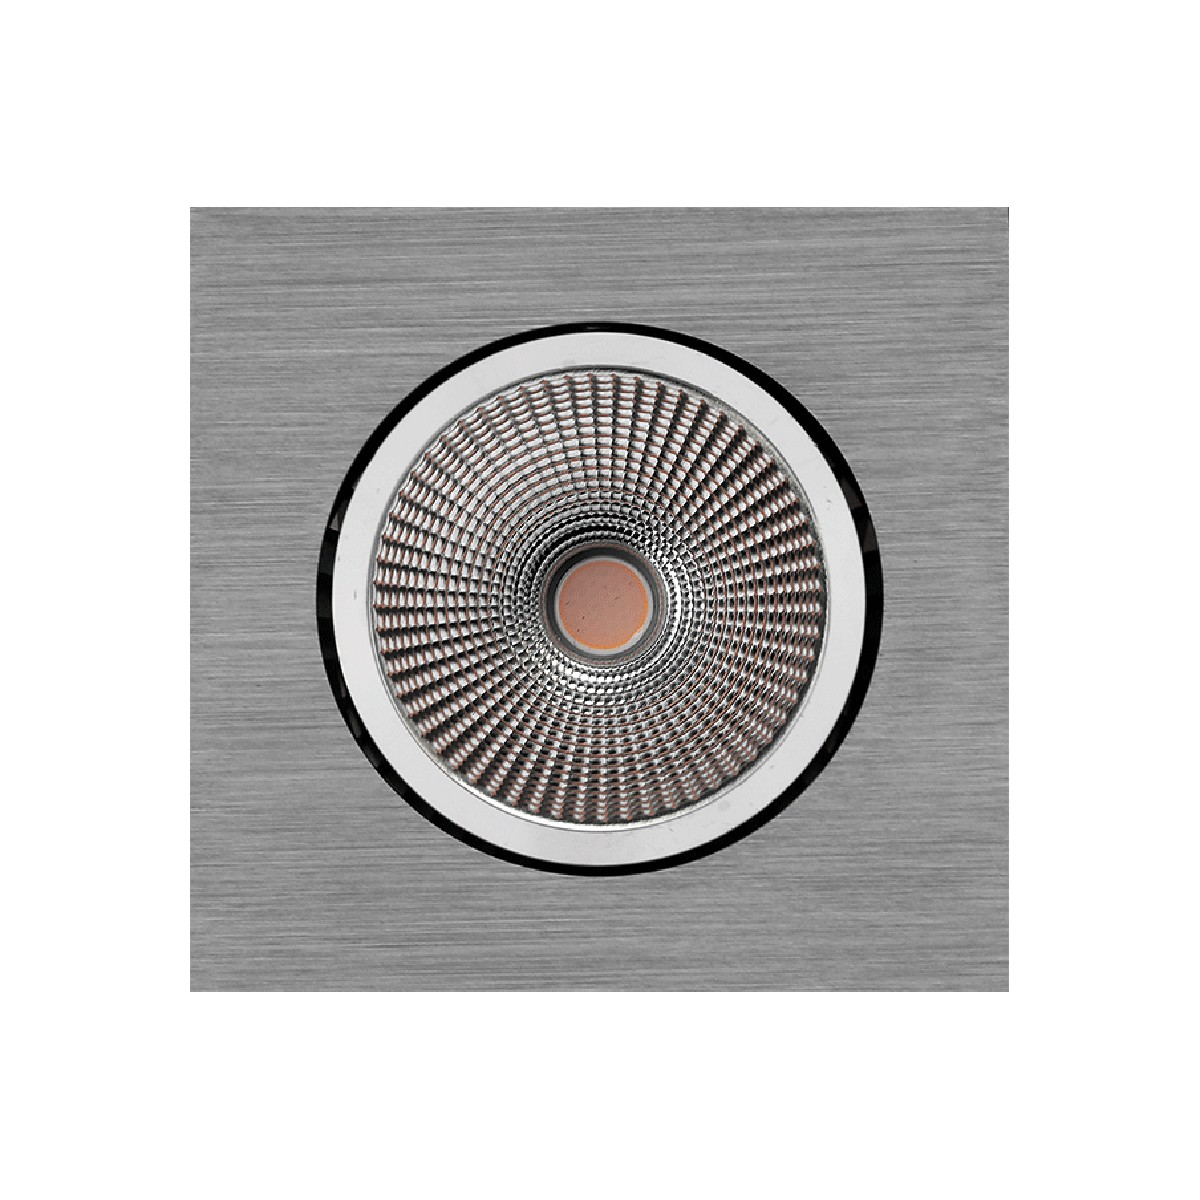 Mobilux MOBiDIM COB 12W Q Einbaustrahler, Dim-to-Warm, alu gebürstet, poliert